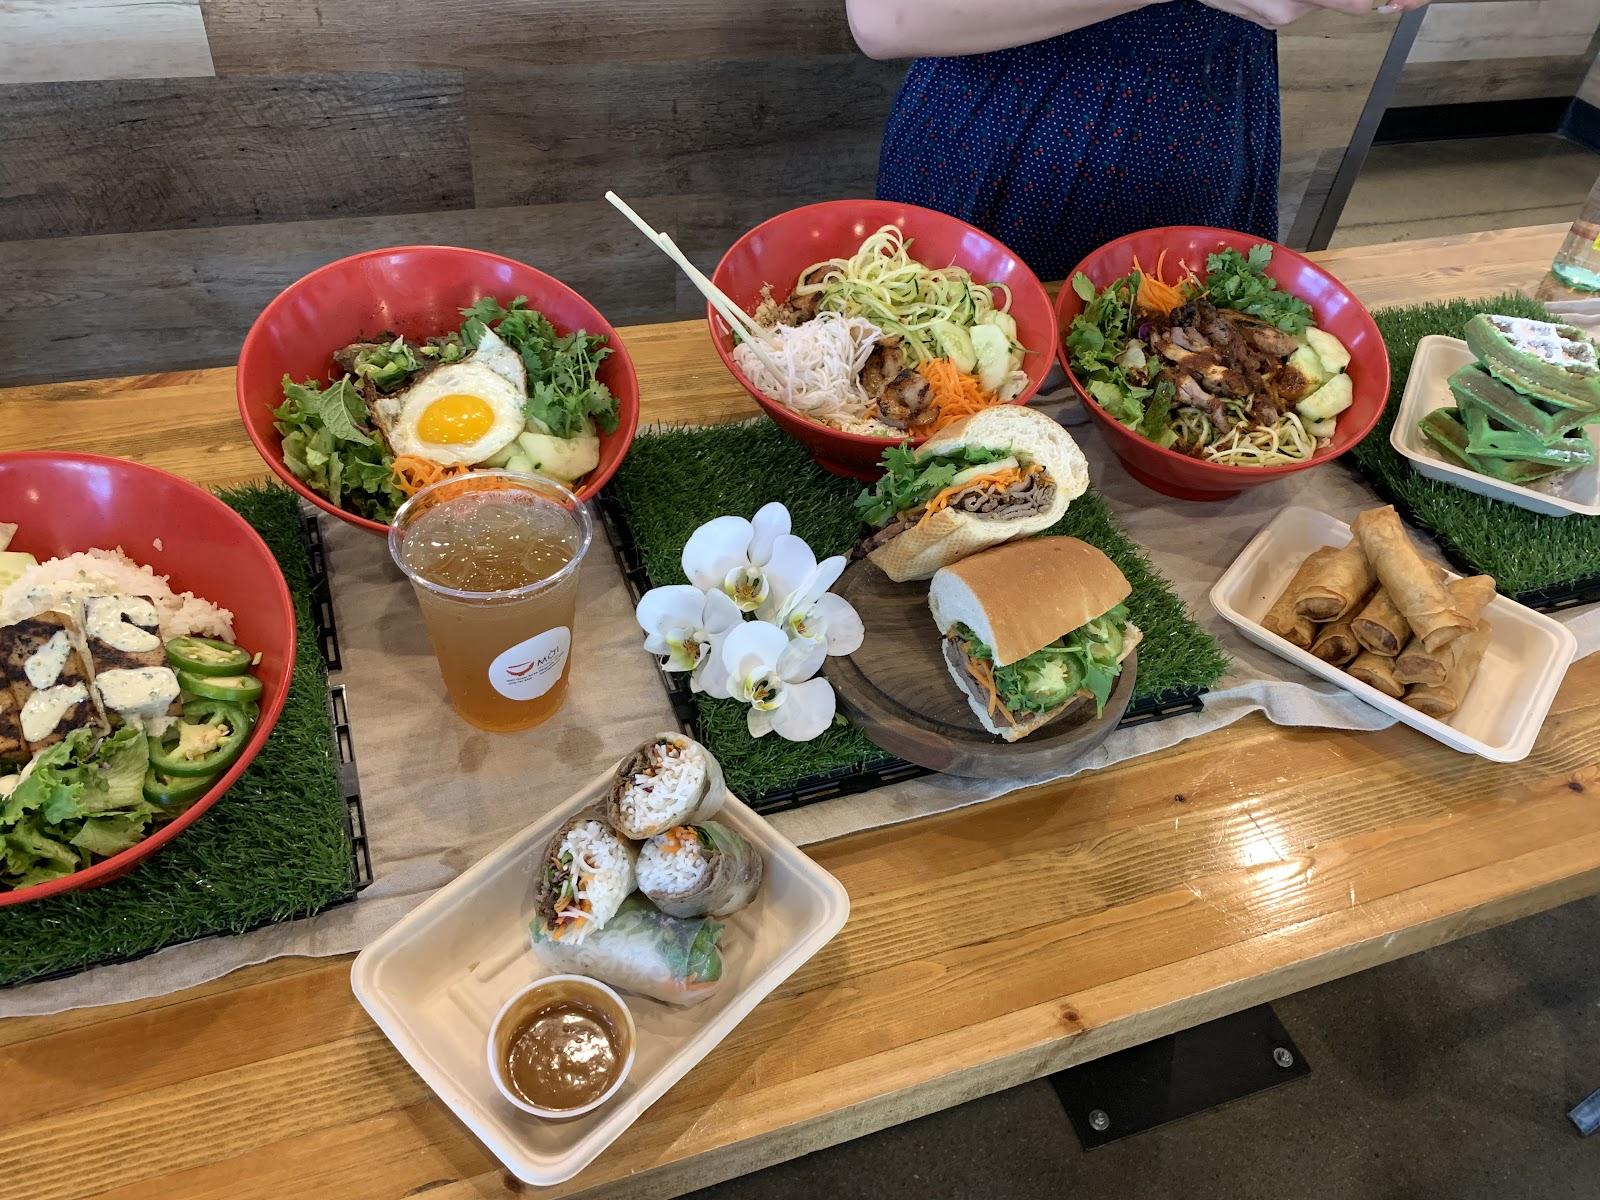 Travel Series: Pflugerville Texas Foodie. Pflugerville Pfoodie #PflugervillePfoodies #foodie #traveltexas #texasblogger #vietnamesefood #bahnmi #freshfood #tru #smalltown #smalltowntexas #smalltownstexas #thehappymustardseed Moi Vietnamese Grill Pflugerville Texas